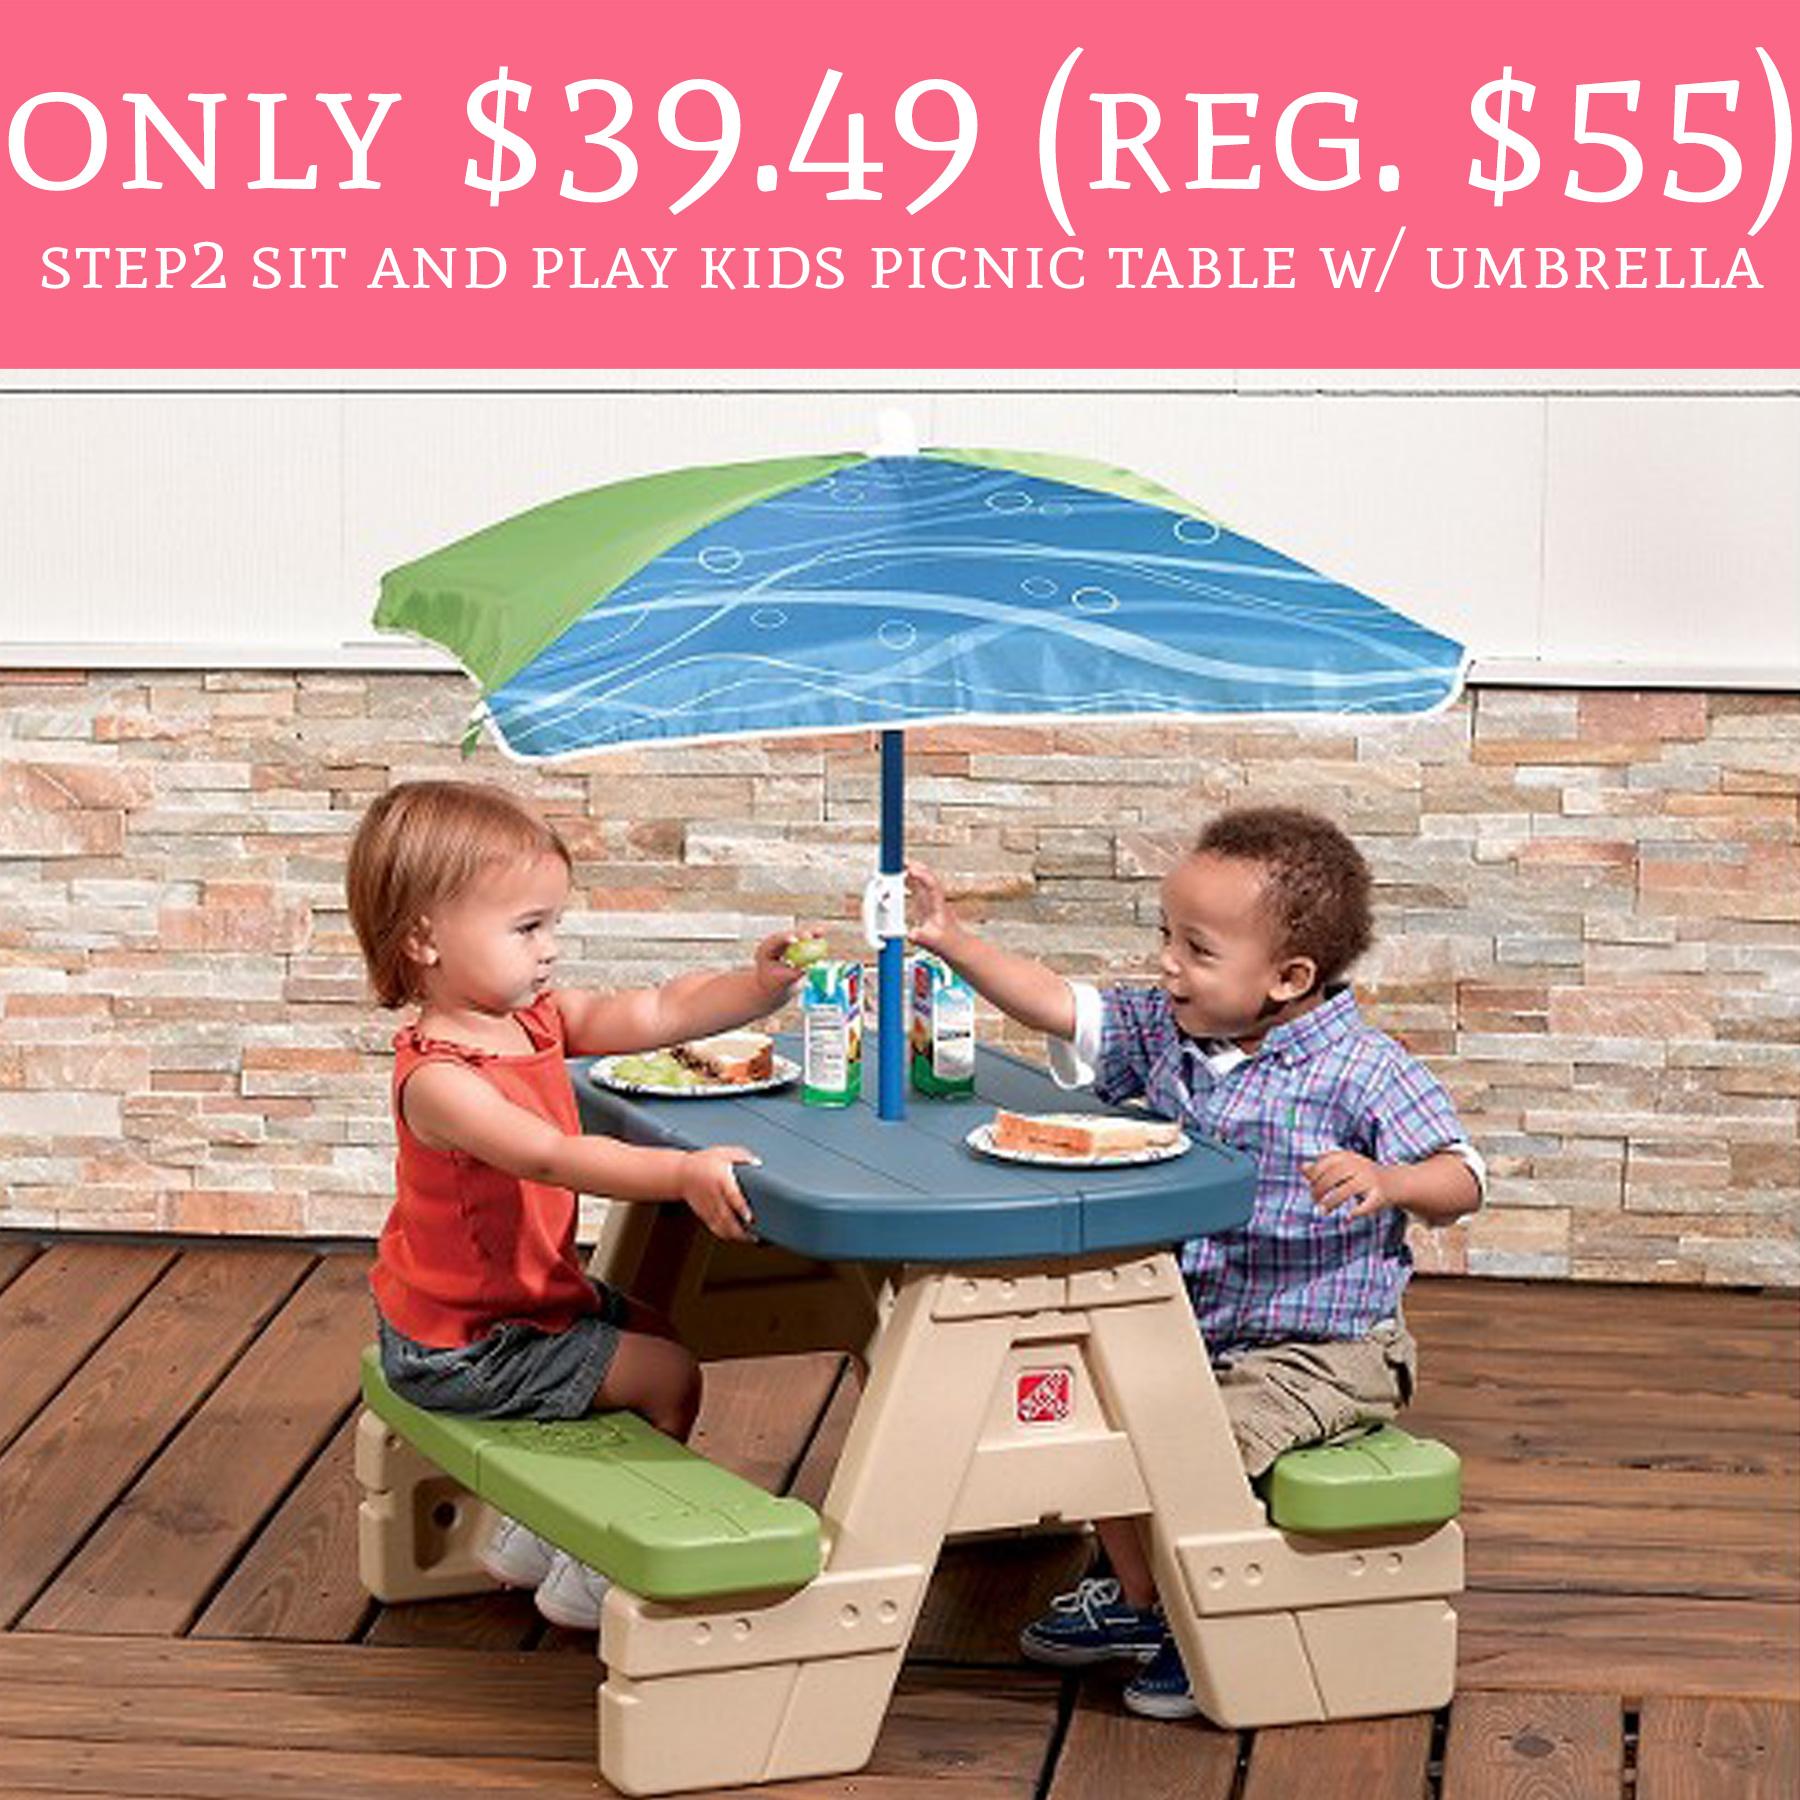 Rare savings regular 55 step2 sit play kids - Children s picnic table with umbrella ...